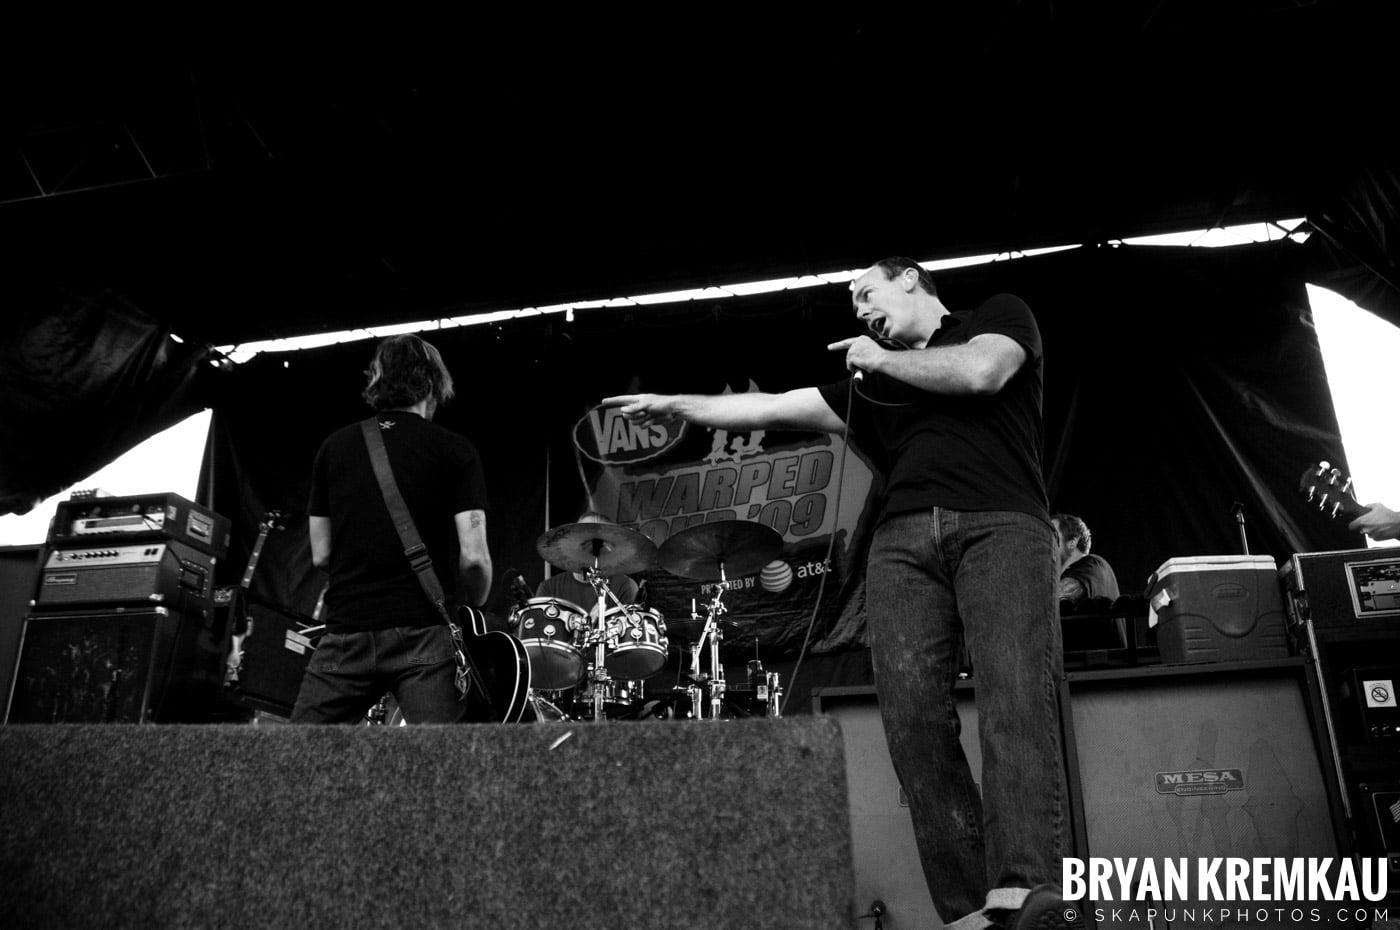 Bad Religion @ Warped Tour 2009, Scranton PA - 07.15.09 (8)